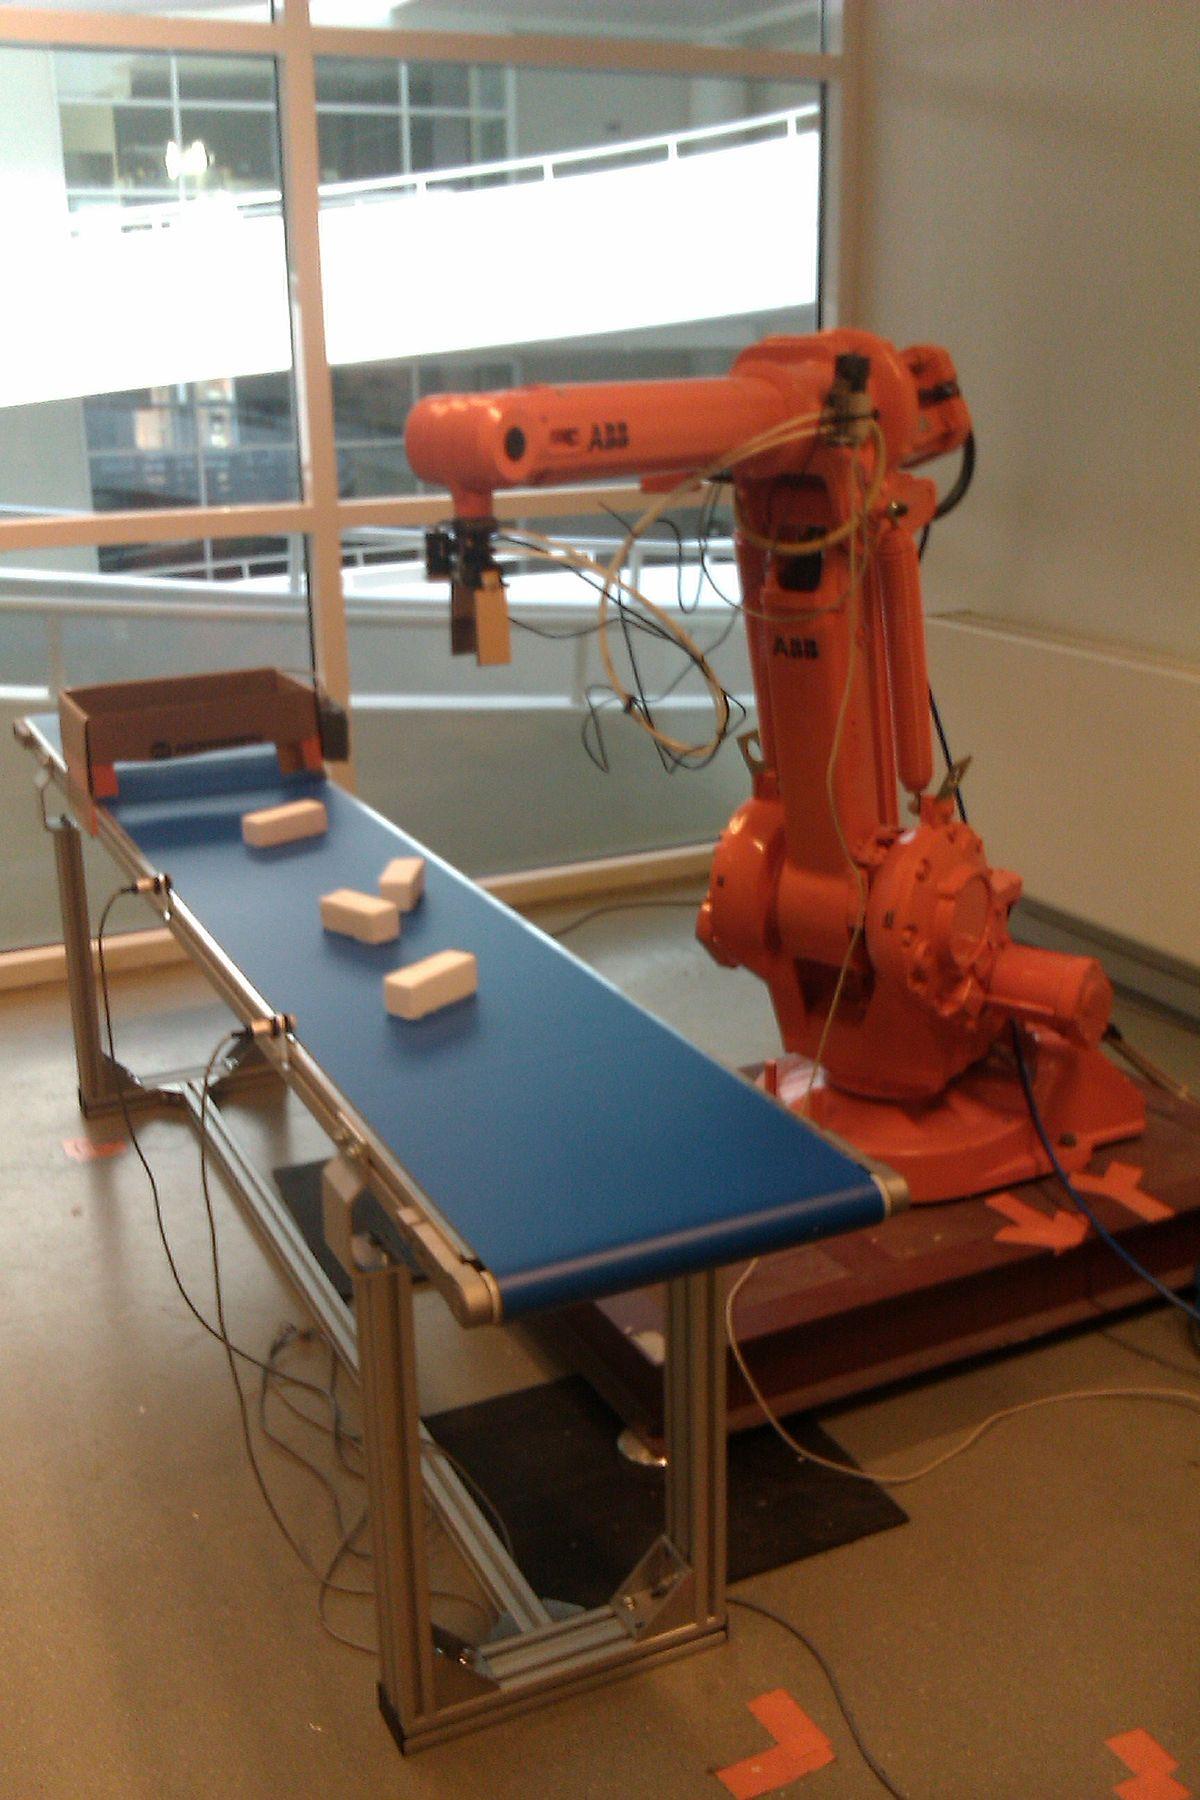 RobotWorx - ABB IRB 1400